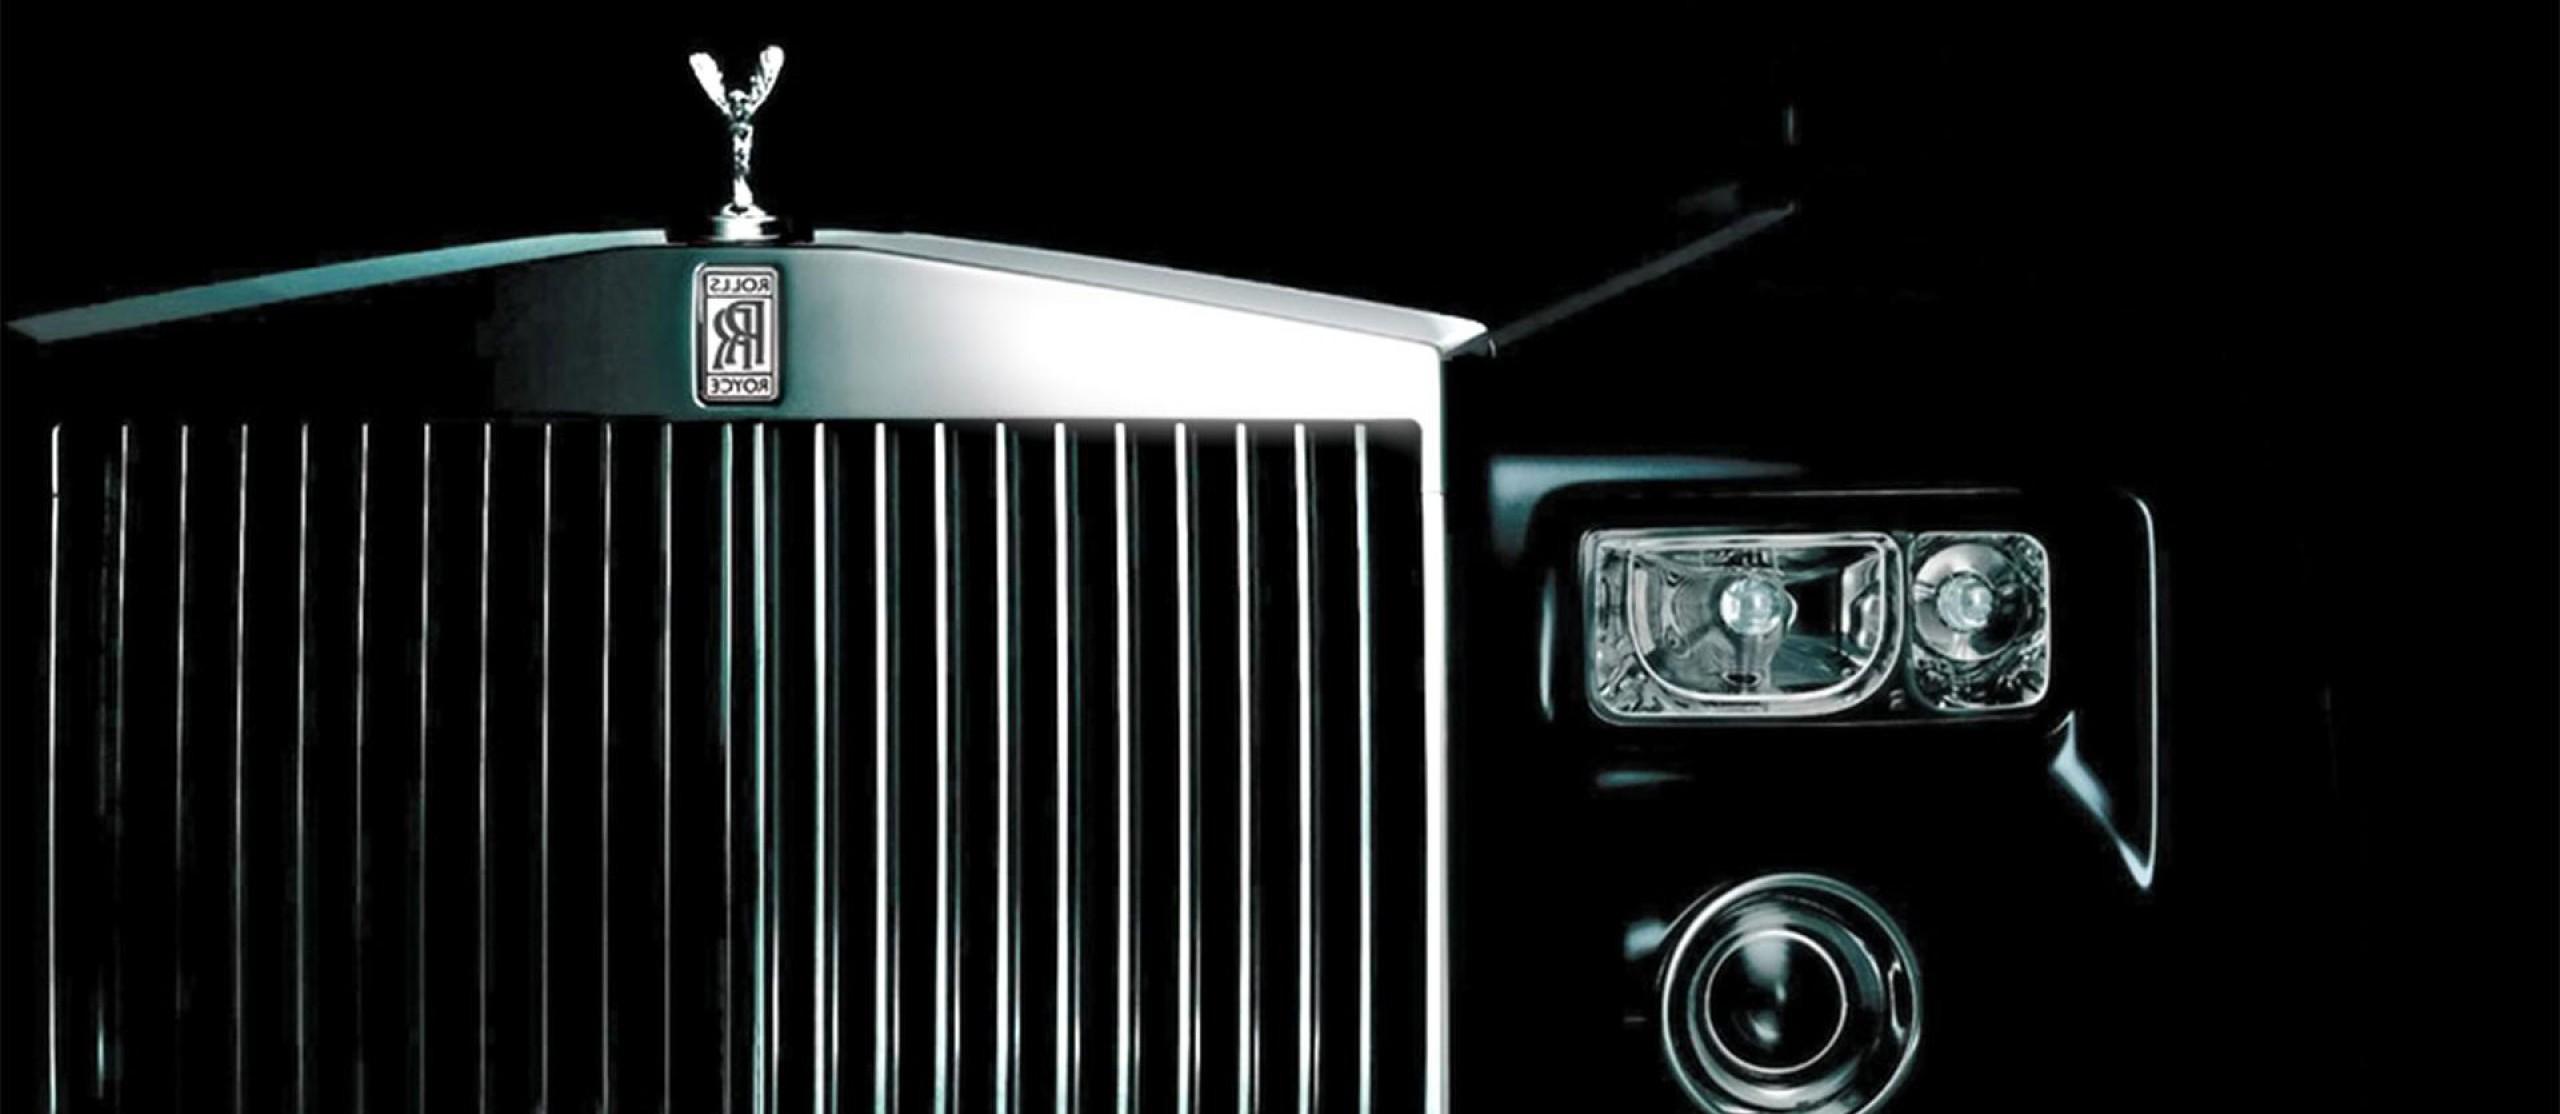 Rolls Royce - Mai Excellent